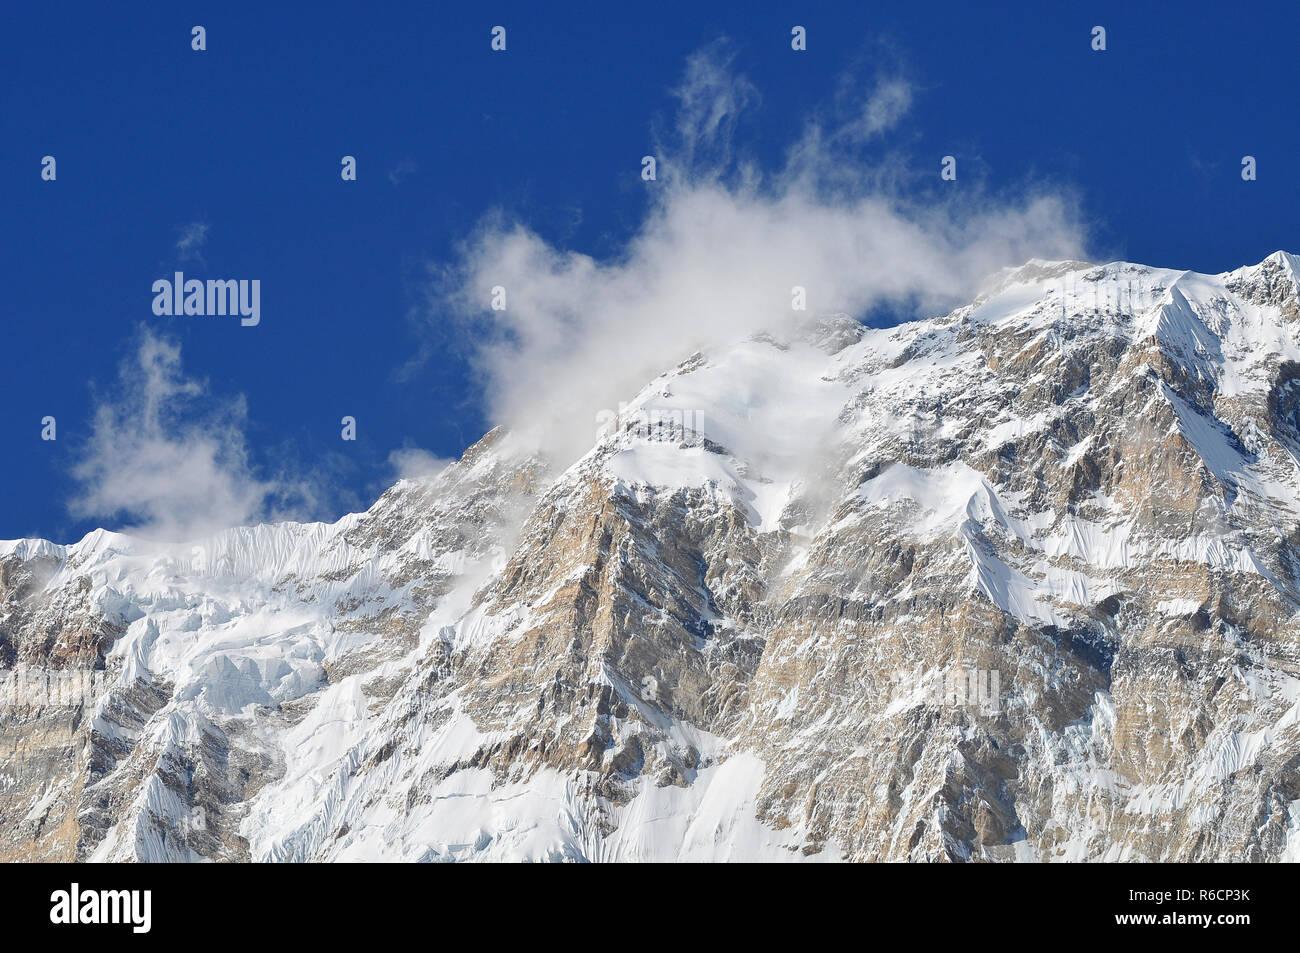 Nepal, Annapurna Conservation Area, Singu Chuli (Fluted Peak) One Of The Trekking Peaks In The Nepali Himalaya Range The Peak Is Located Just West Of  Stock Photo